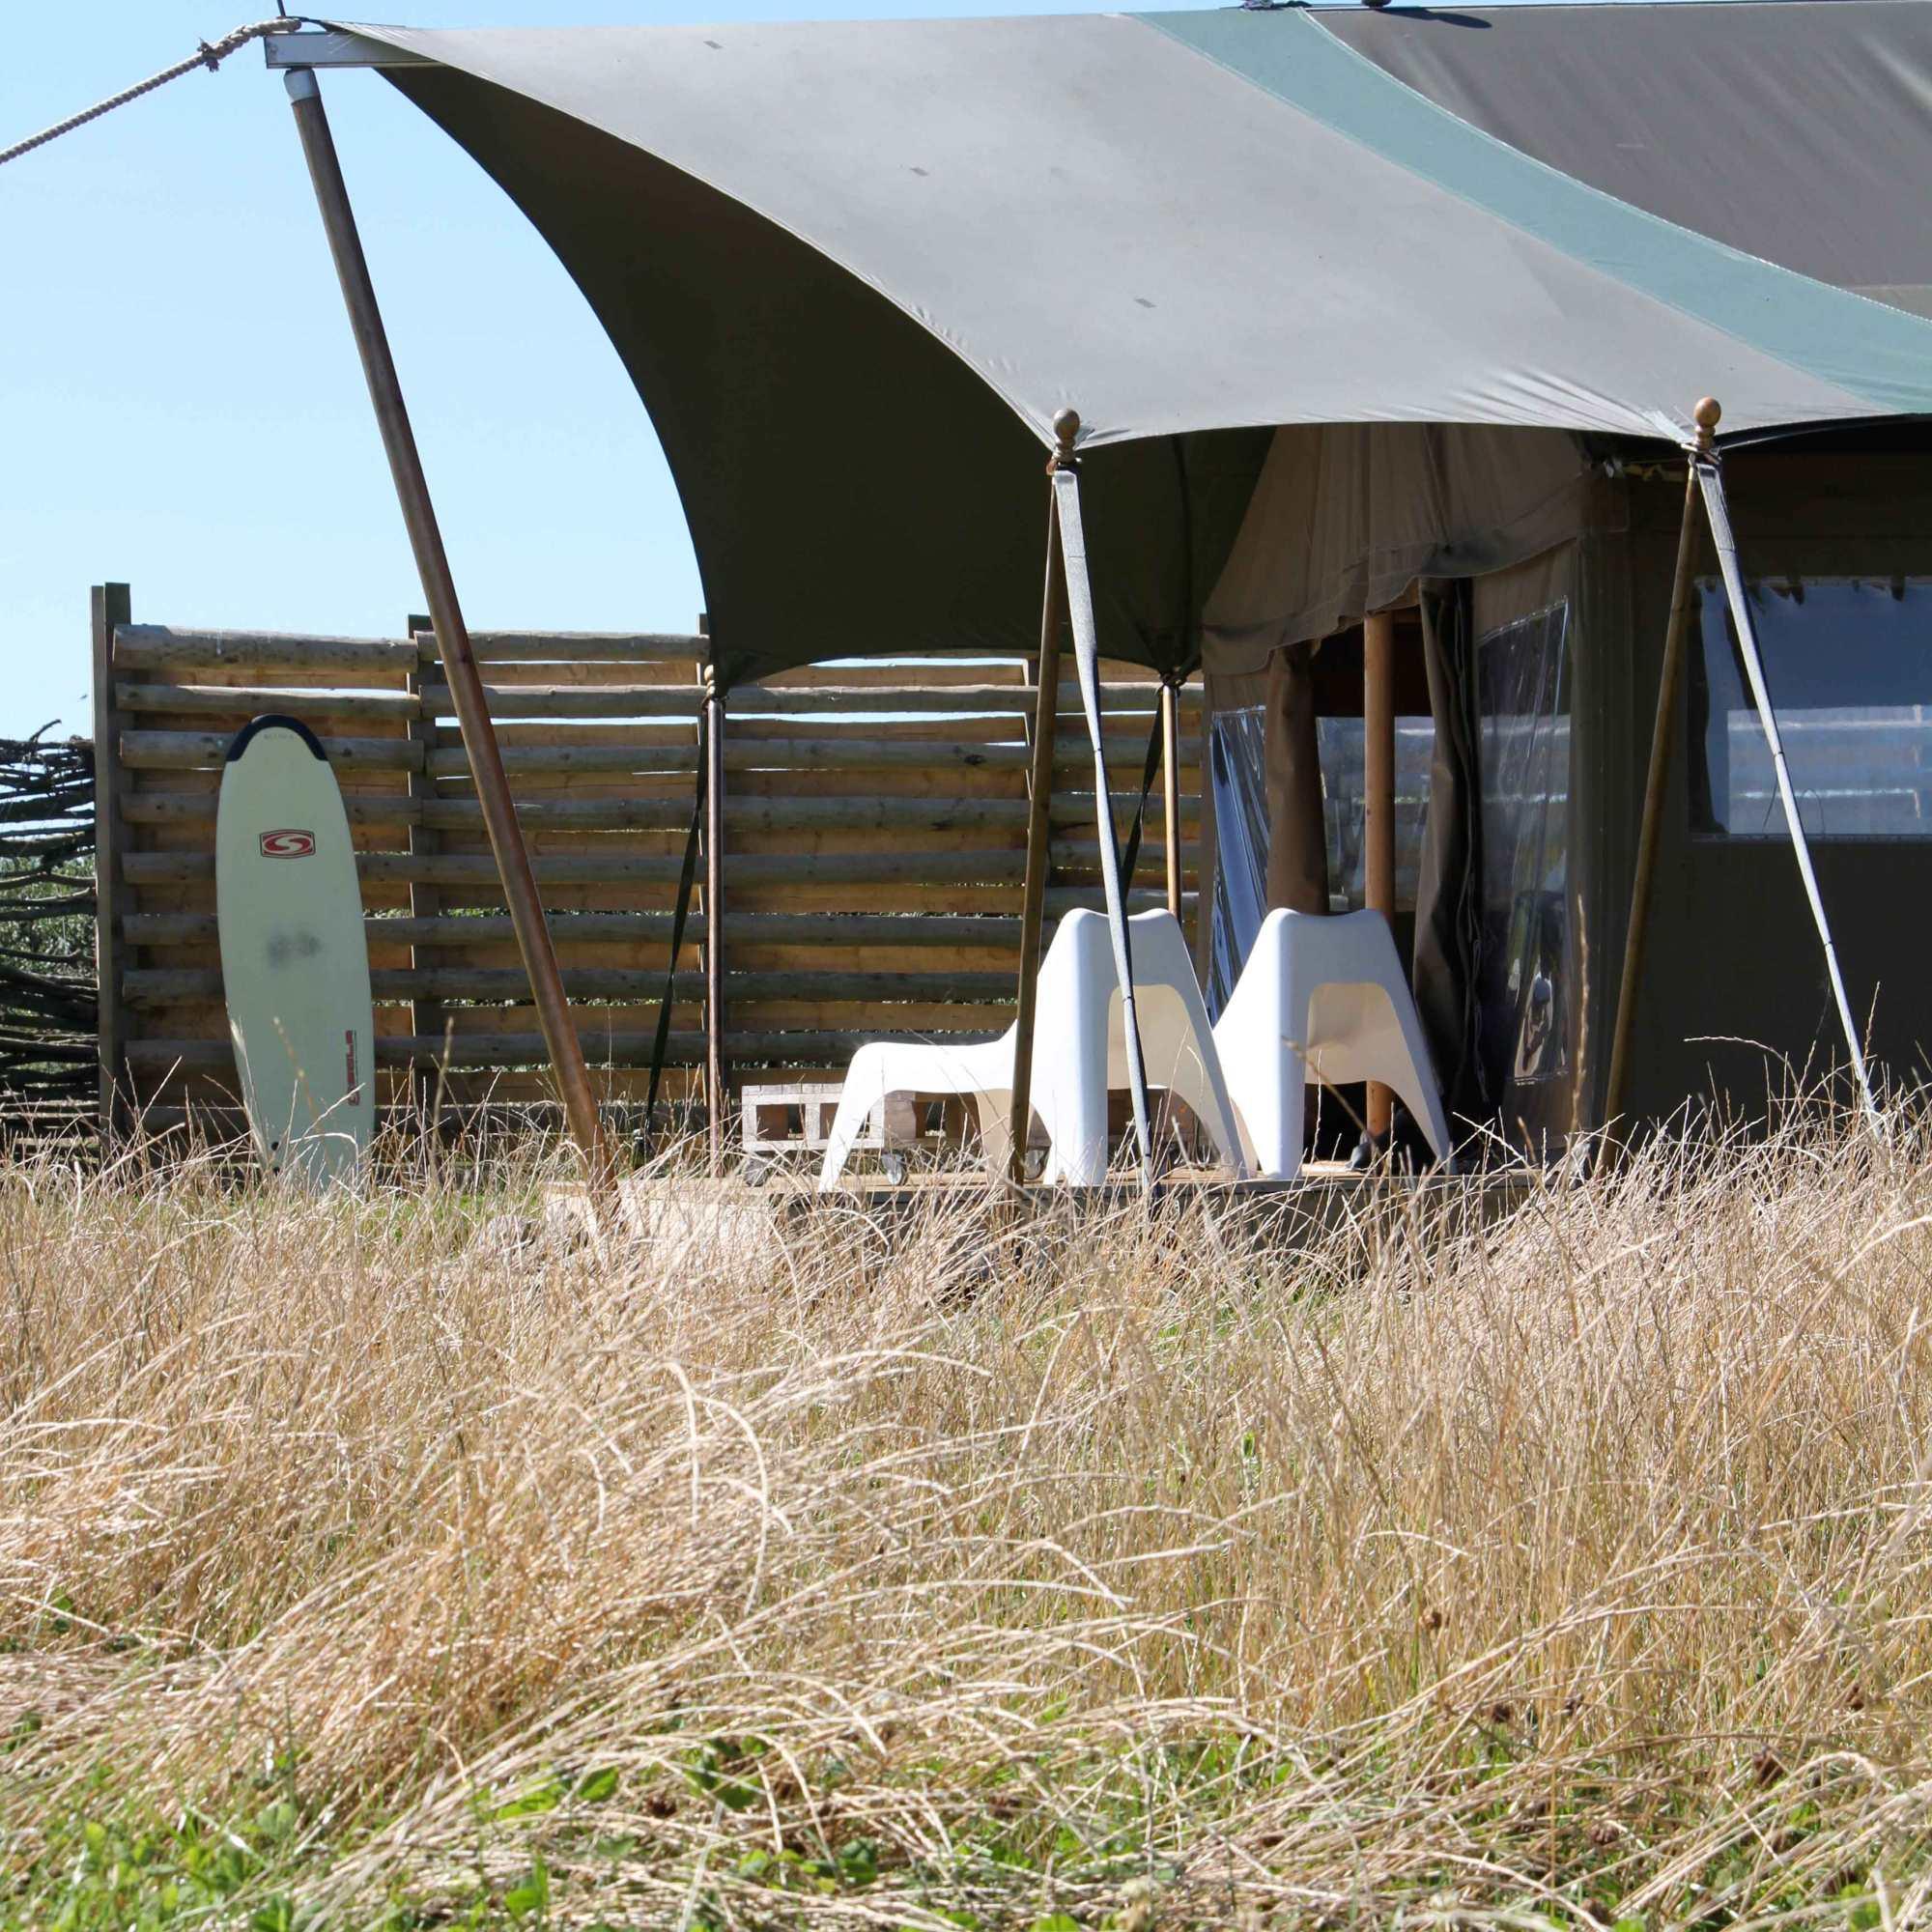 a surfboard leaning against the wooden windbreak outside Hobie safari tent